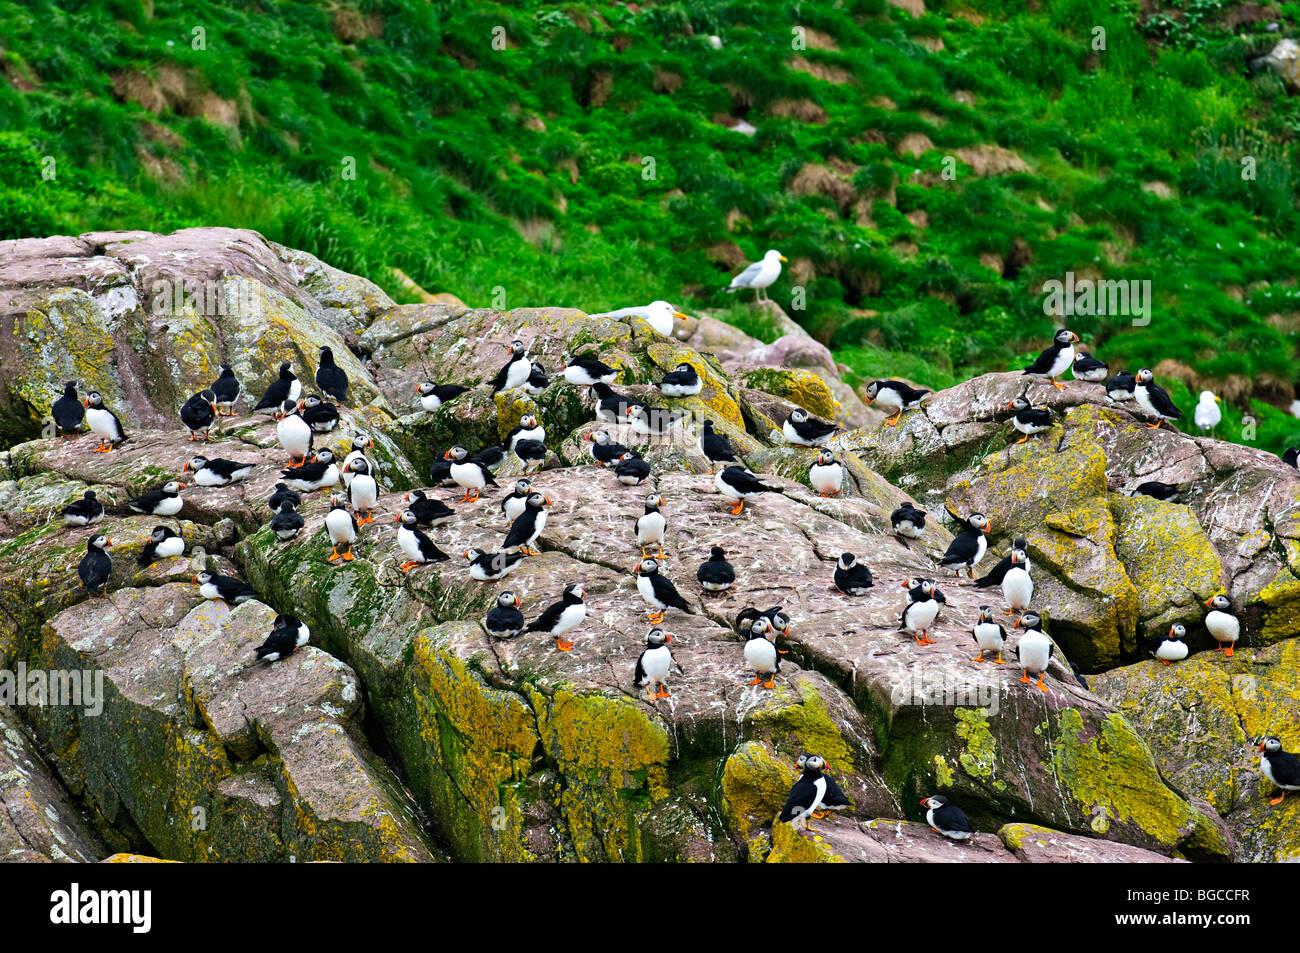 Puffin birds on rocky island in Newfoundland, Canada - Stock Image